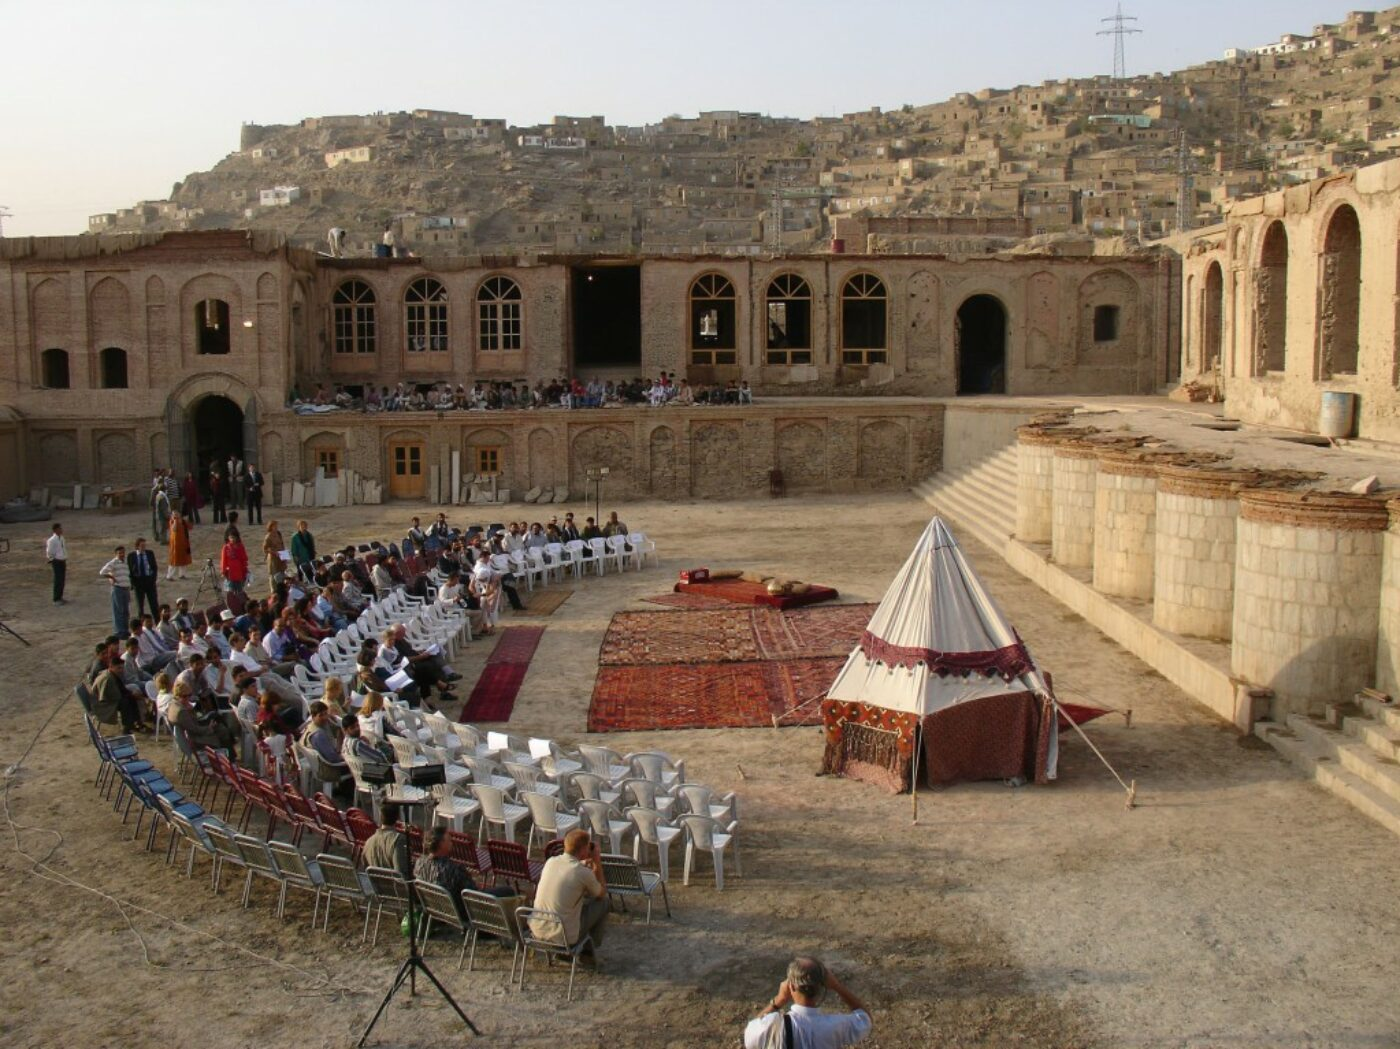 Afghanistan: Bagh-e Babur Public Garden